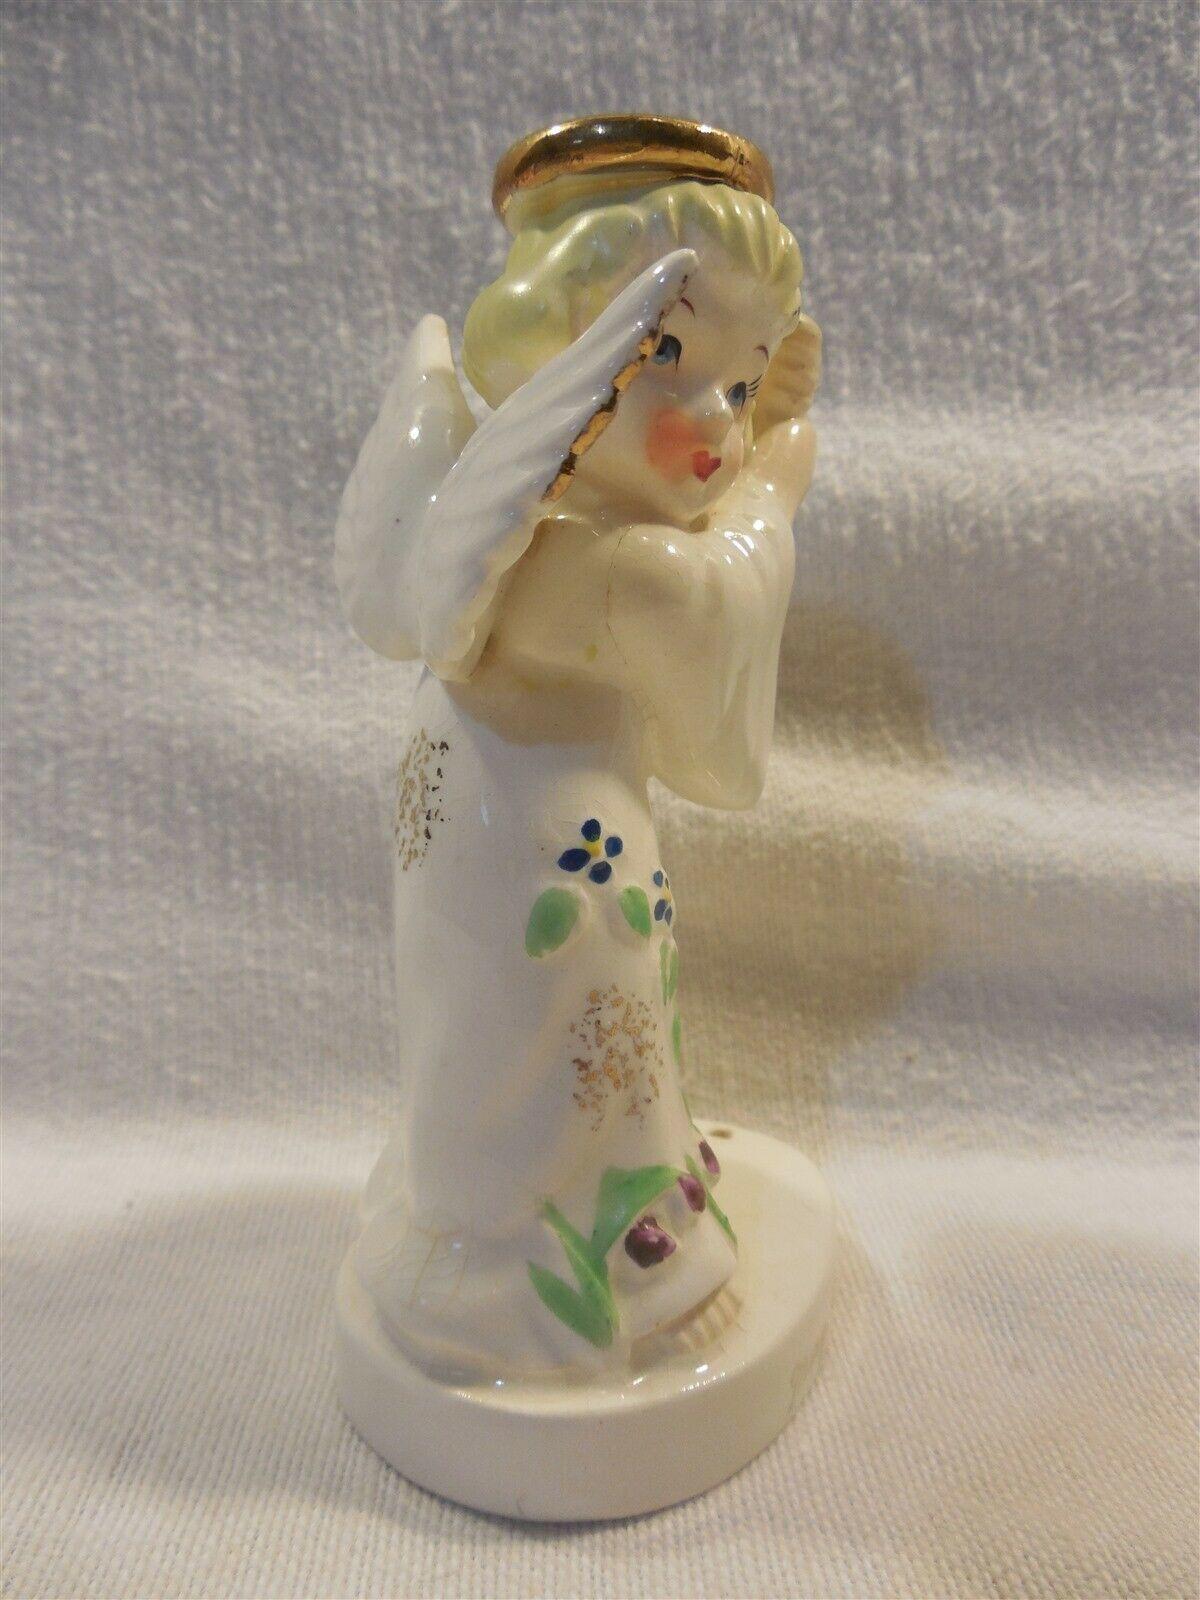 Vintage Lipper & Mann Japan Ceramic May Birthday Angel Figurine w/Umbrella As Is